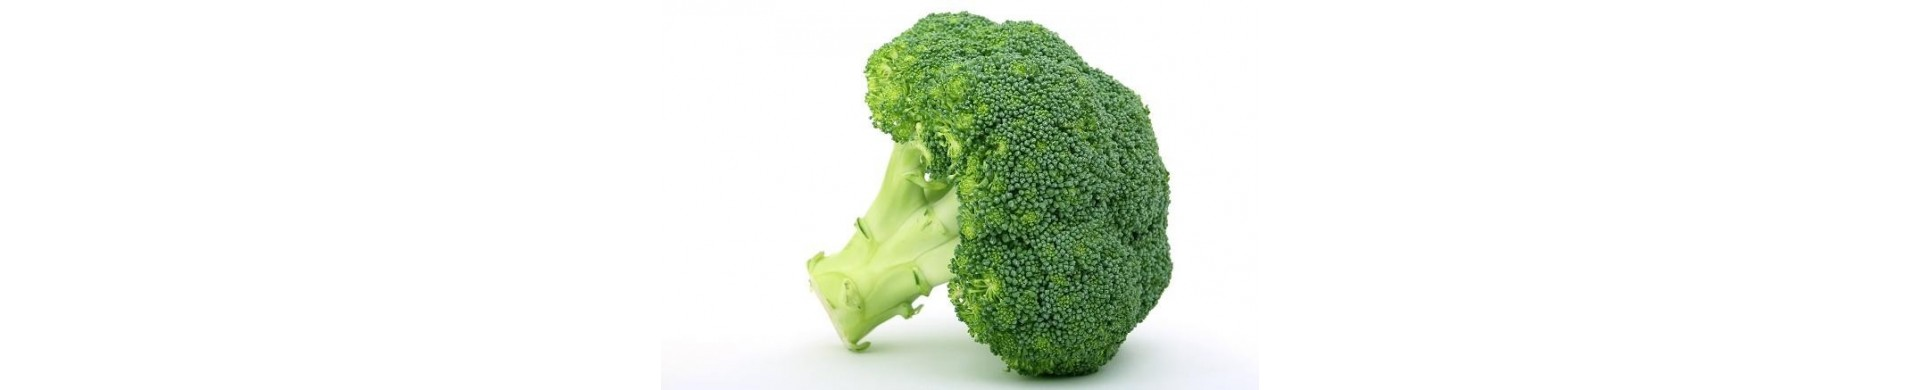 Broccoli Plants - Buy Broccoli Plant